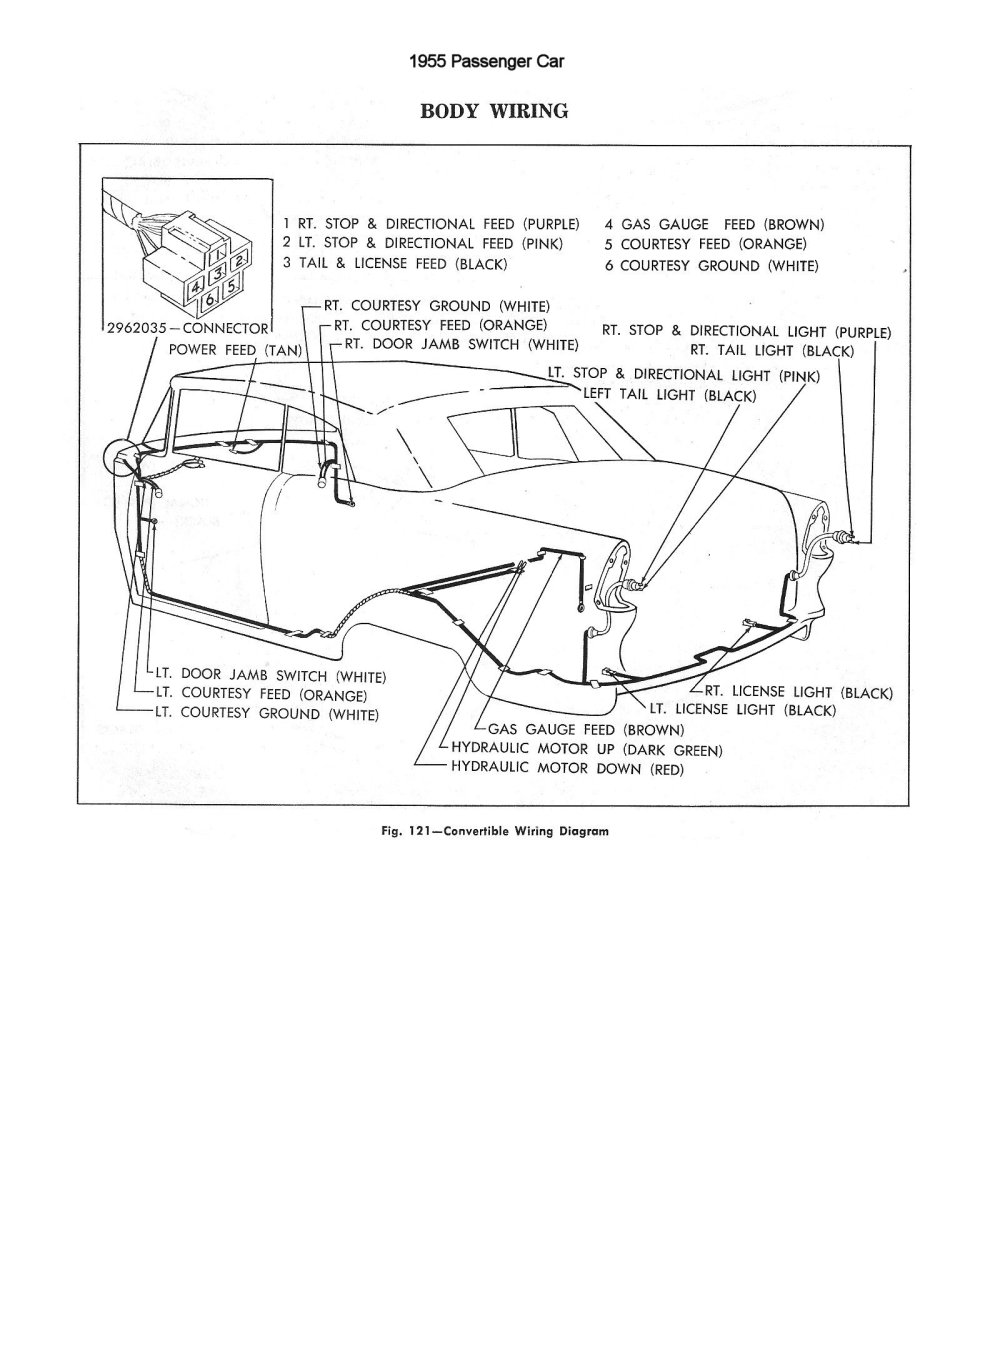 medium resolution of  1955 passenger car body wiring